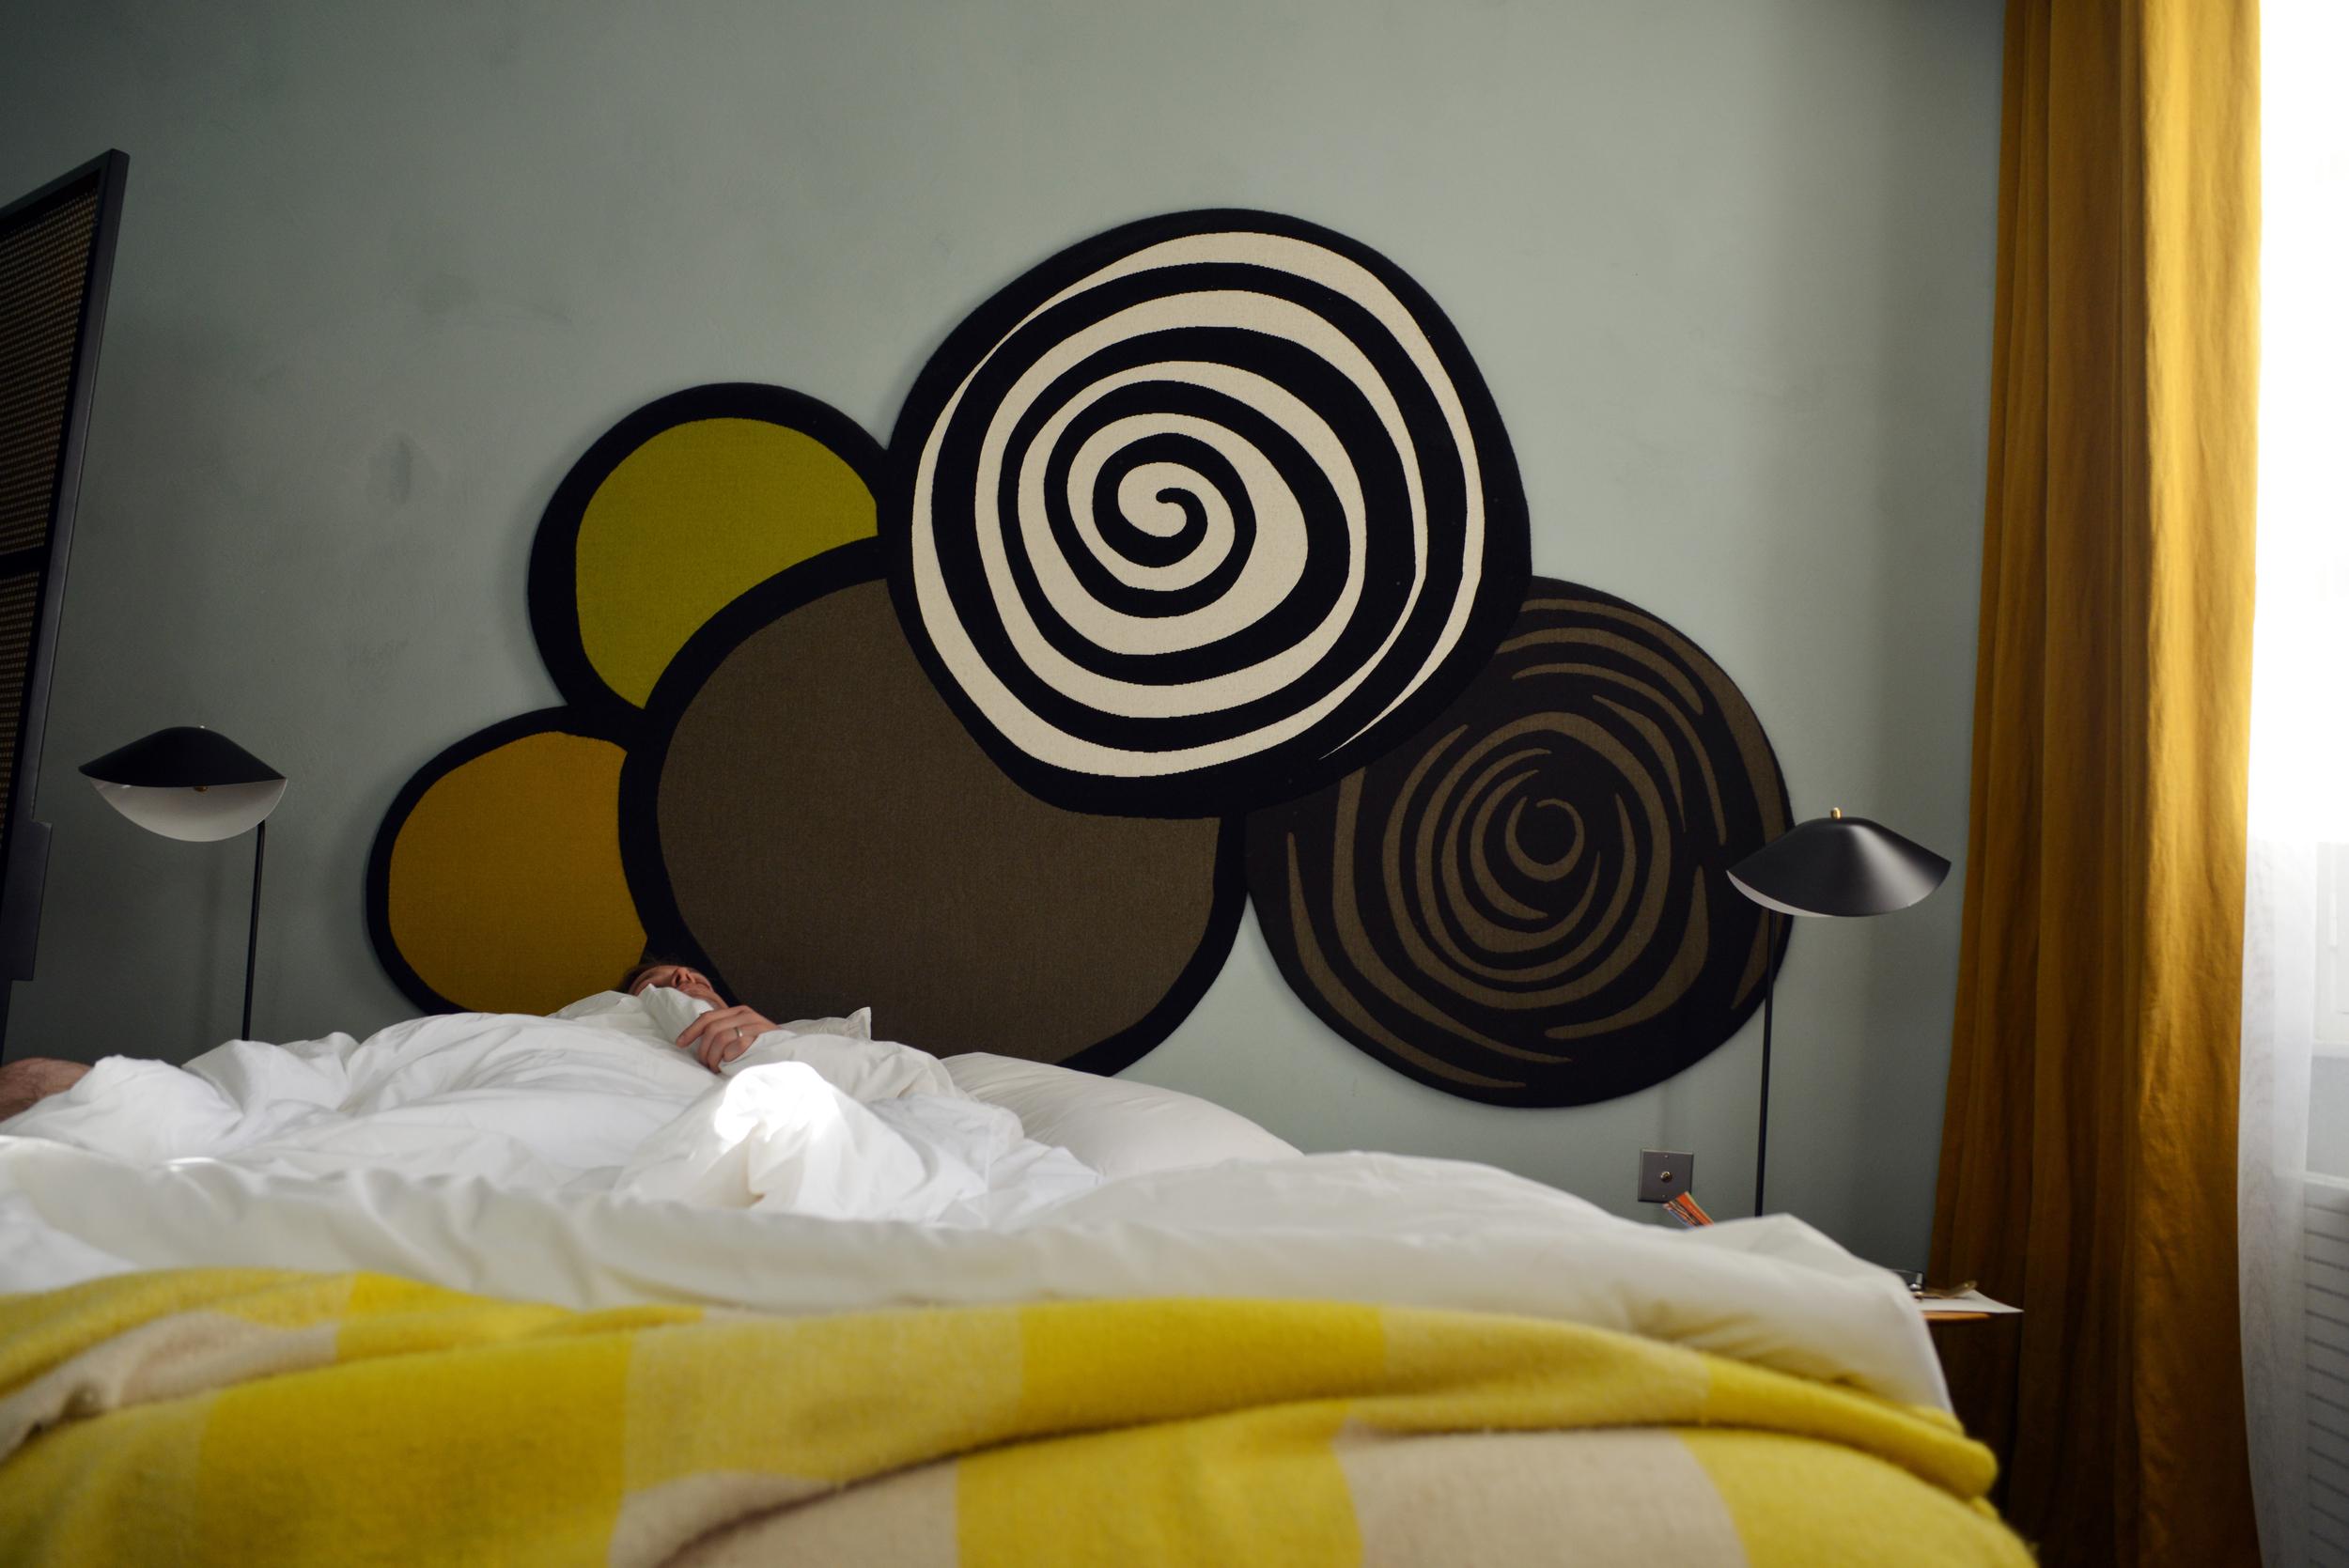 Jack sleeping in at the Hotel du Cloître | Photograph by Lauren L Caron © 2015